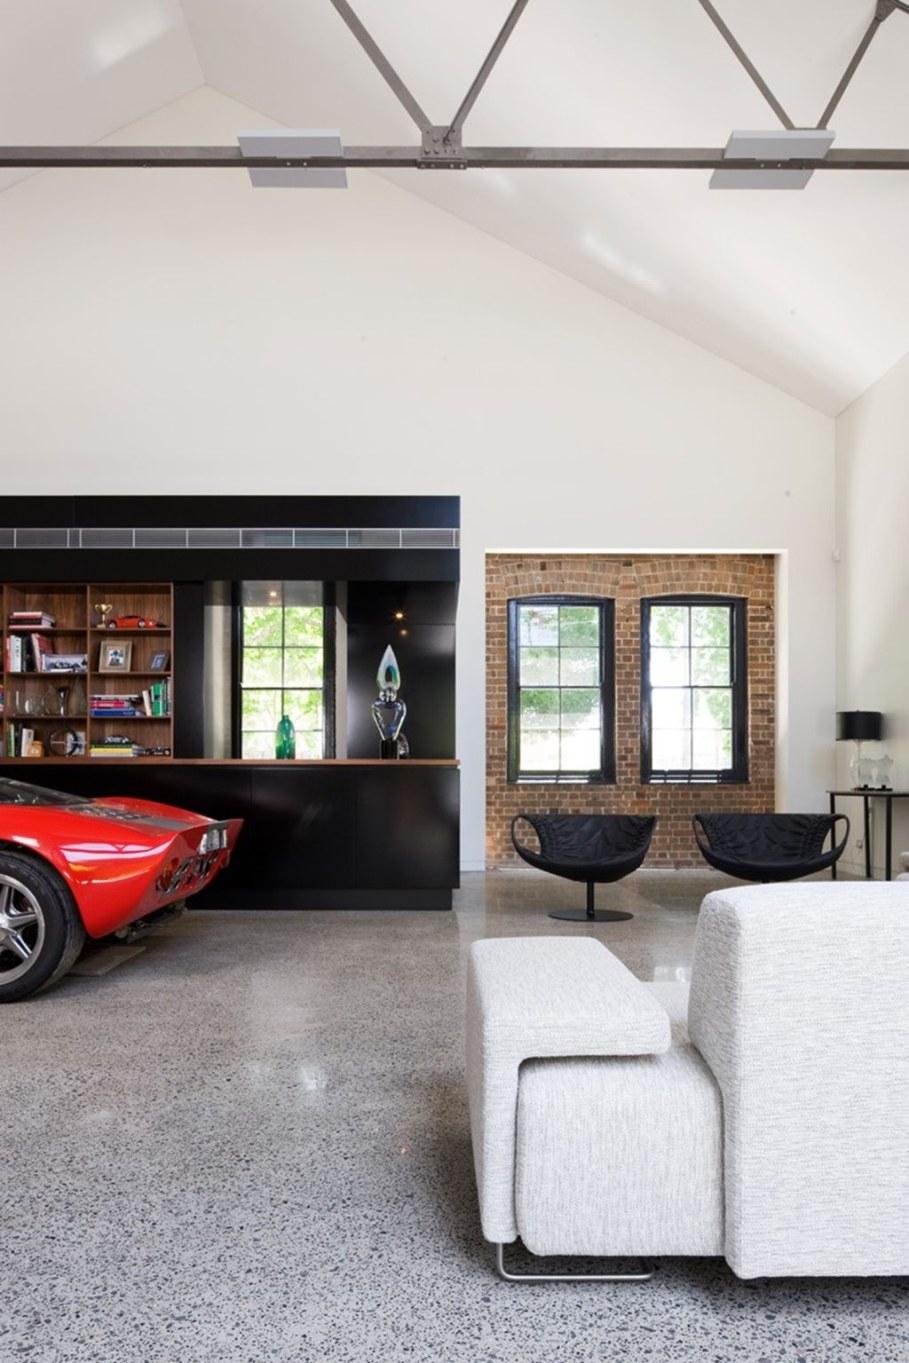 Grand loft house in Australia by Corben Architects studio - Living room 3